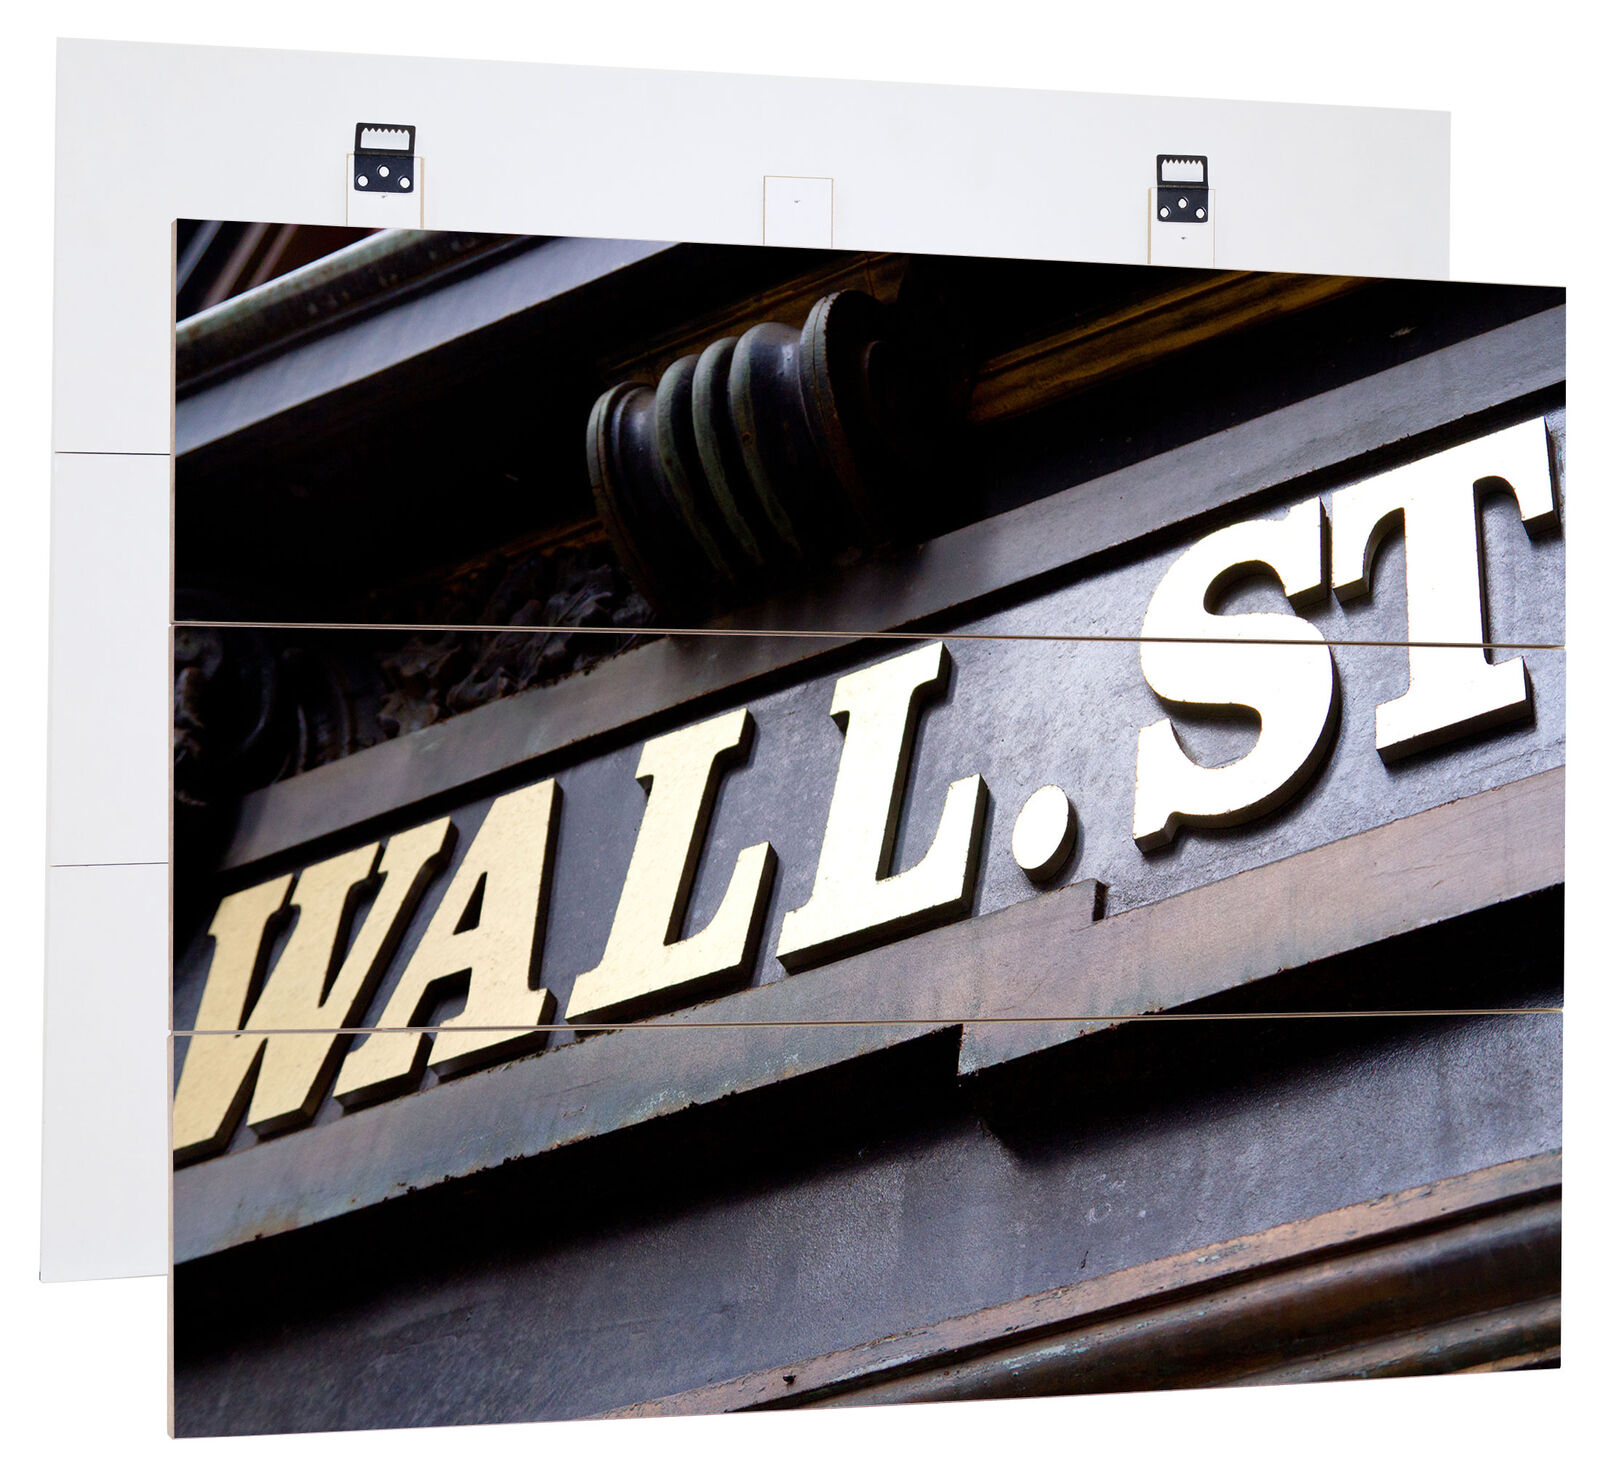 Wall street New york-MDF-panneau bois au bretterlook, décoration